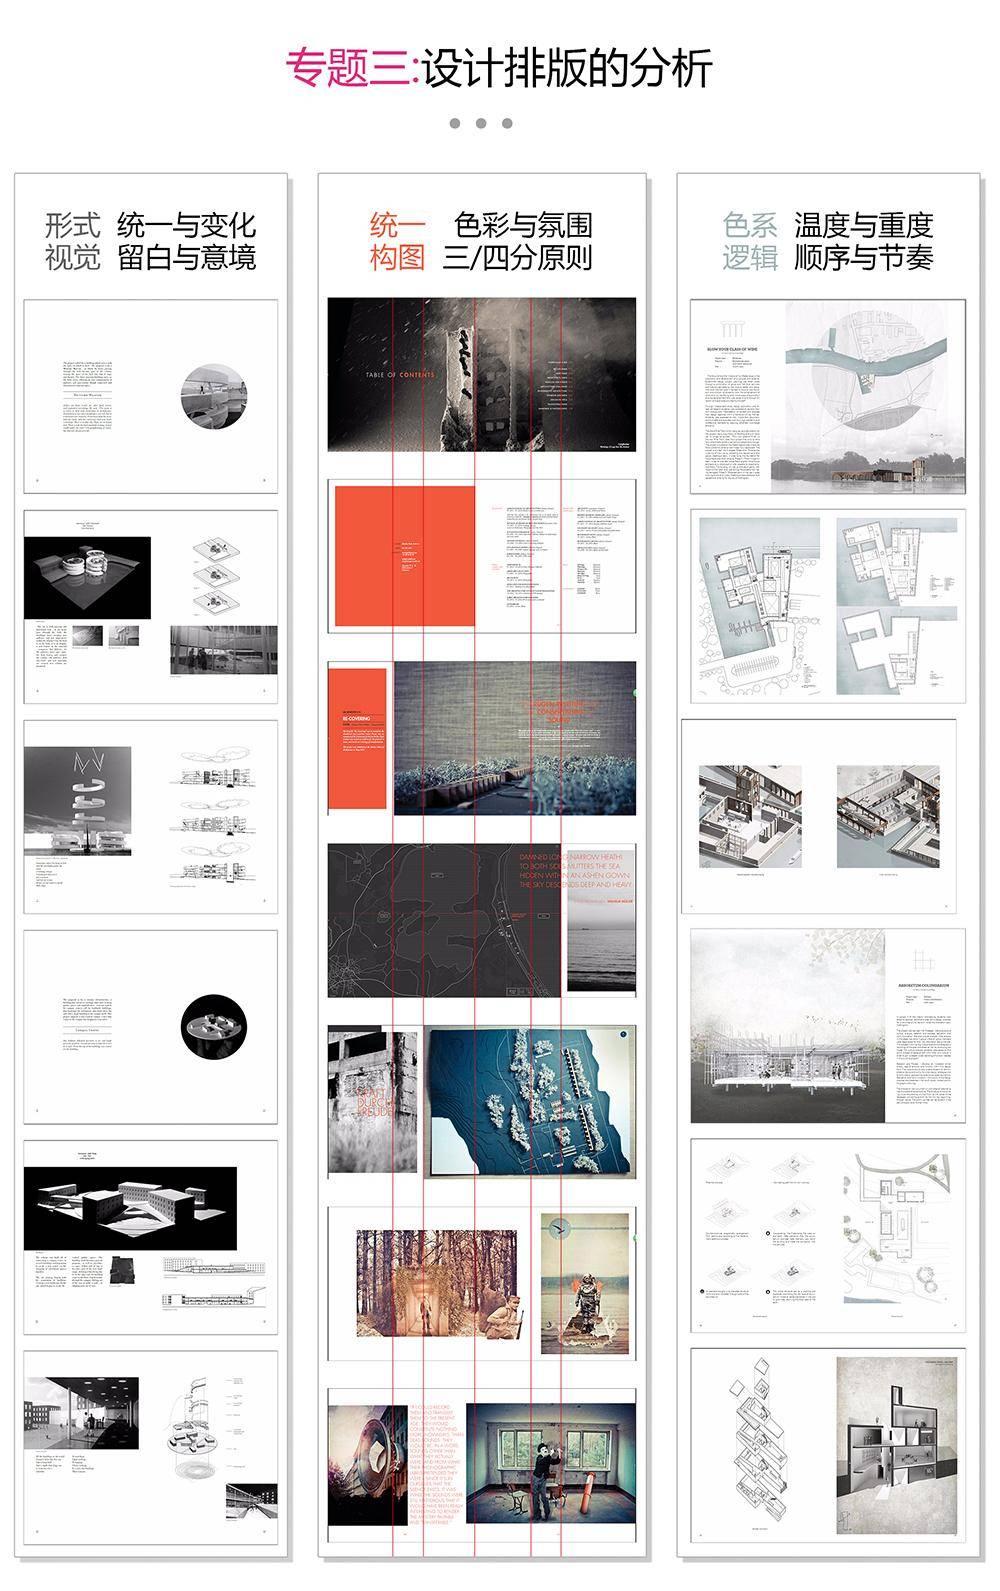 2017/7/8:《indesign排版与设计研习班》图片